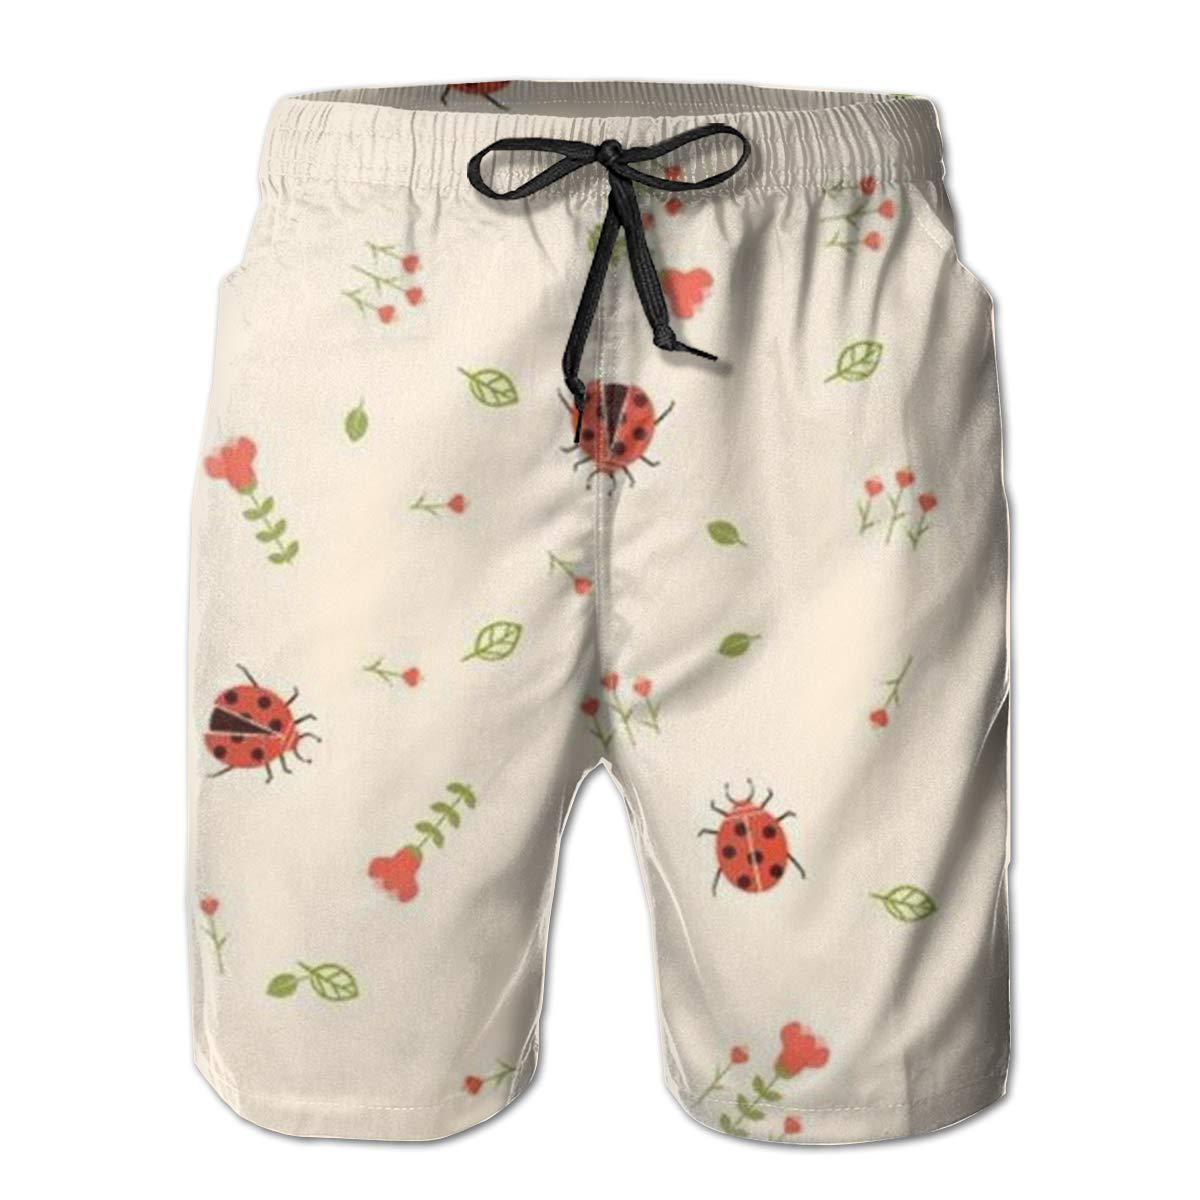 DHVJBC Mens Ladybug Summer Holiday Quick-Drying Swim Trunks Beach Shorts Board Shorts